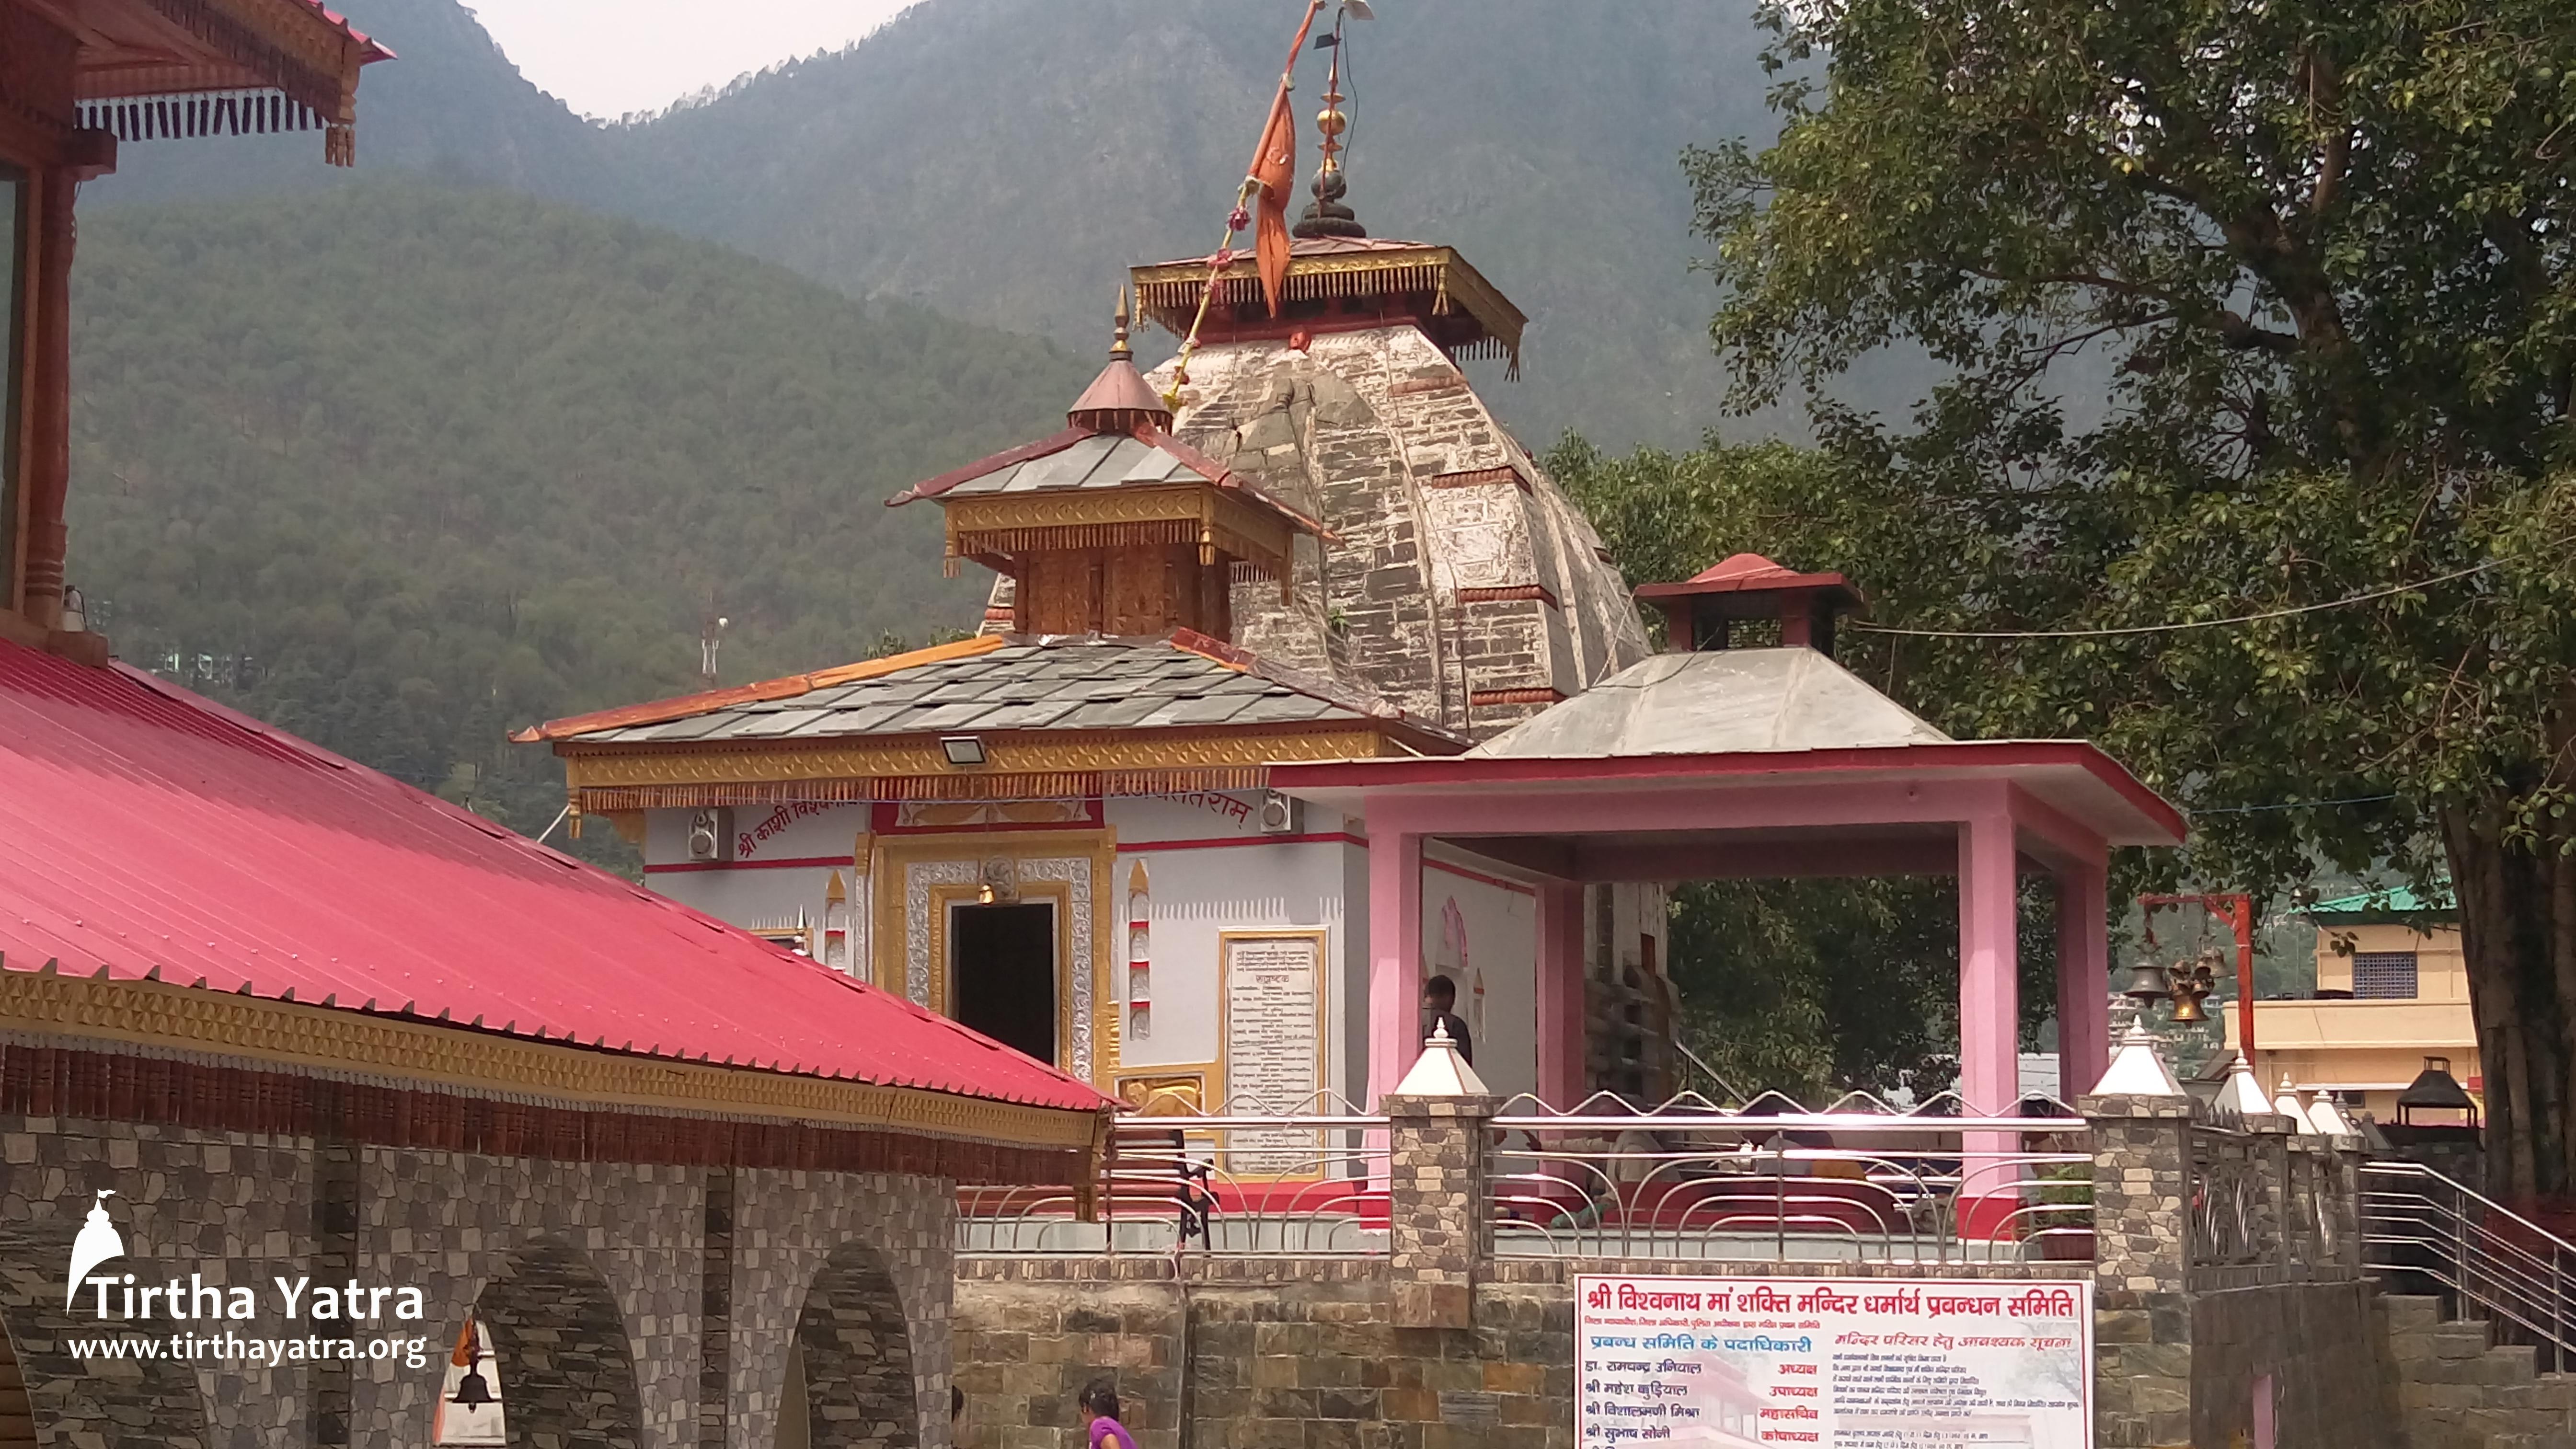 Kashi Vishwanath Temple, Uttarkashi